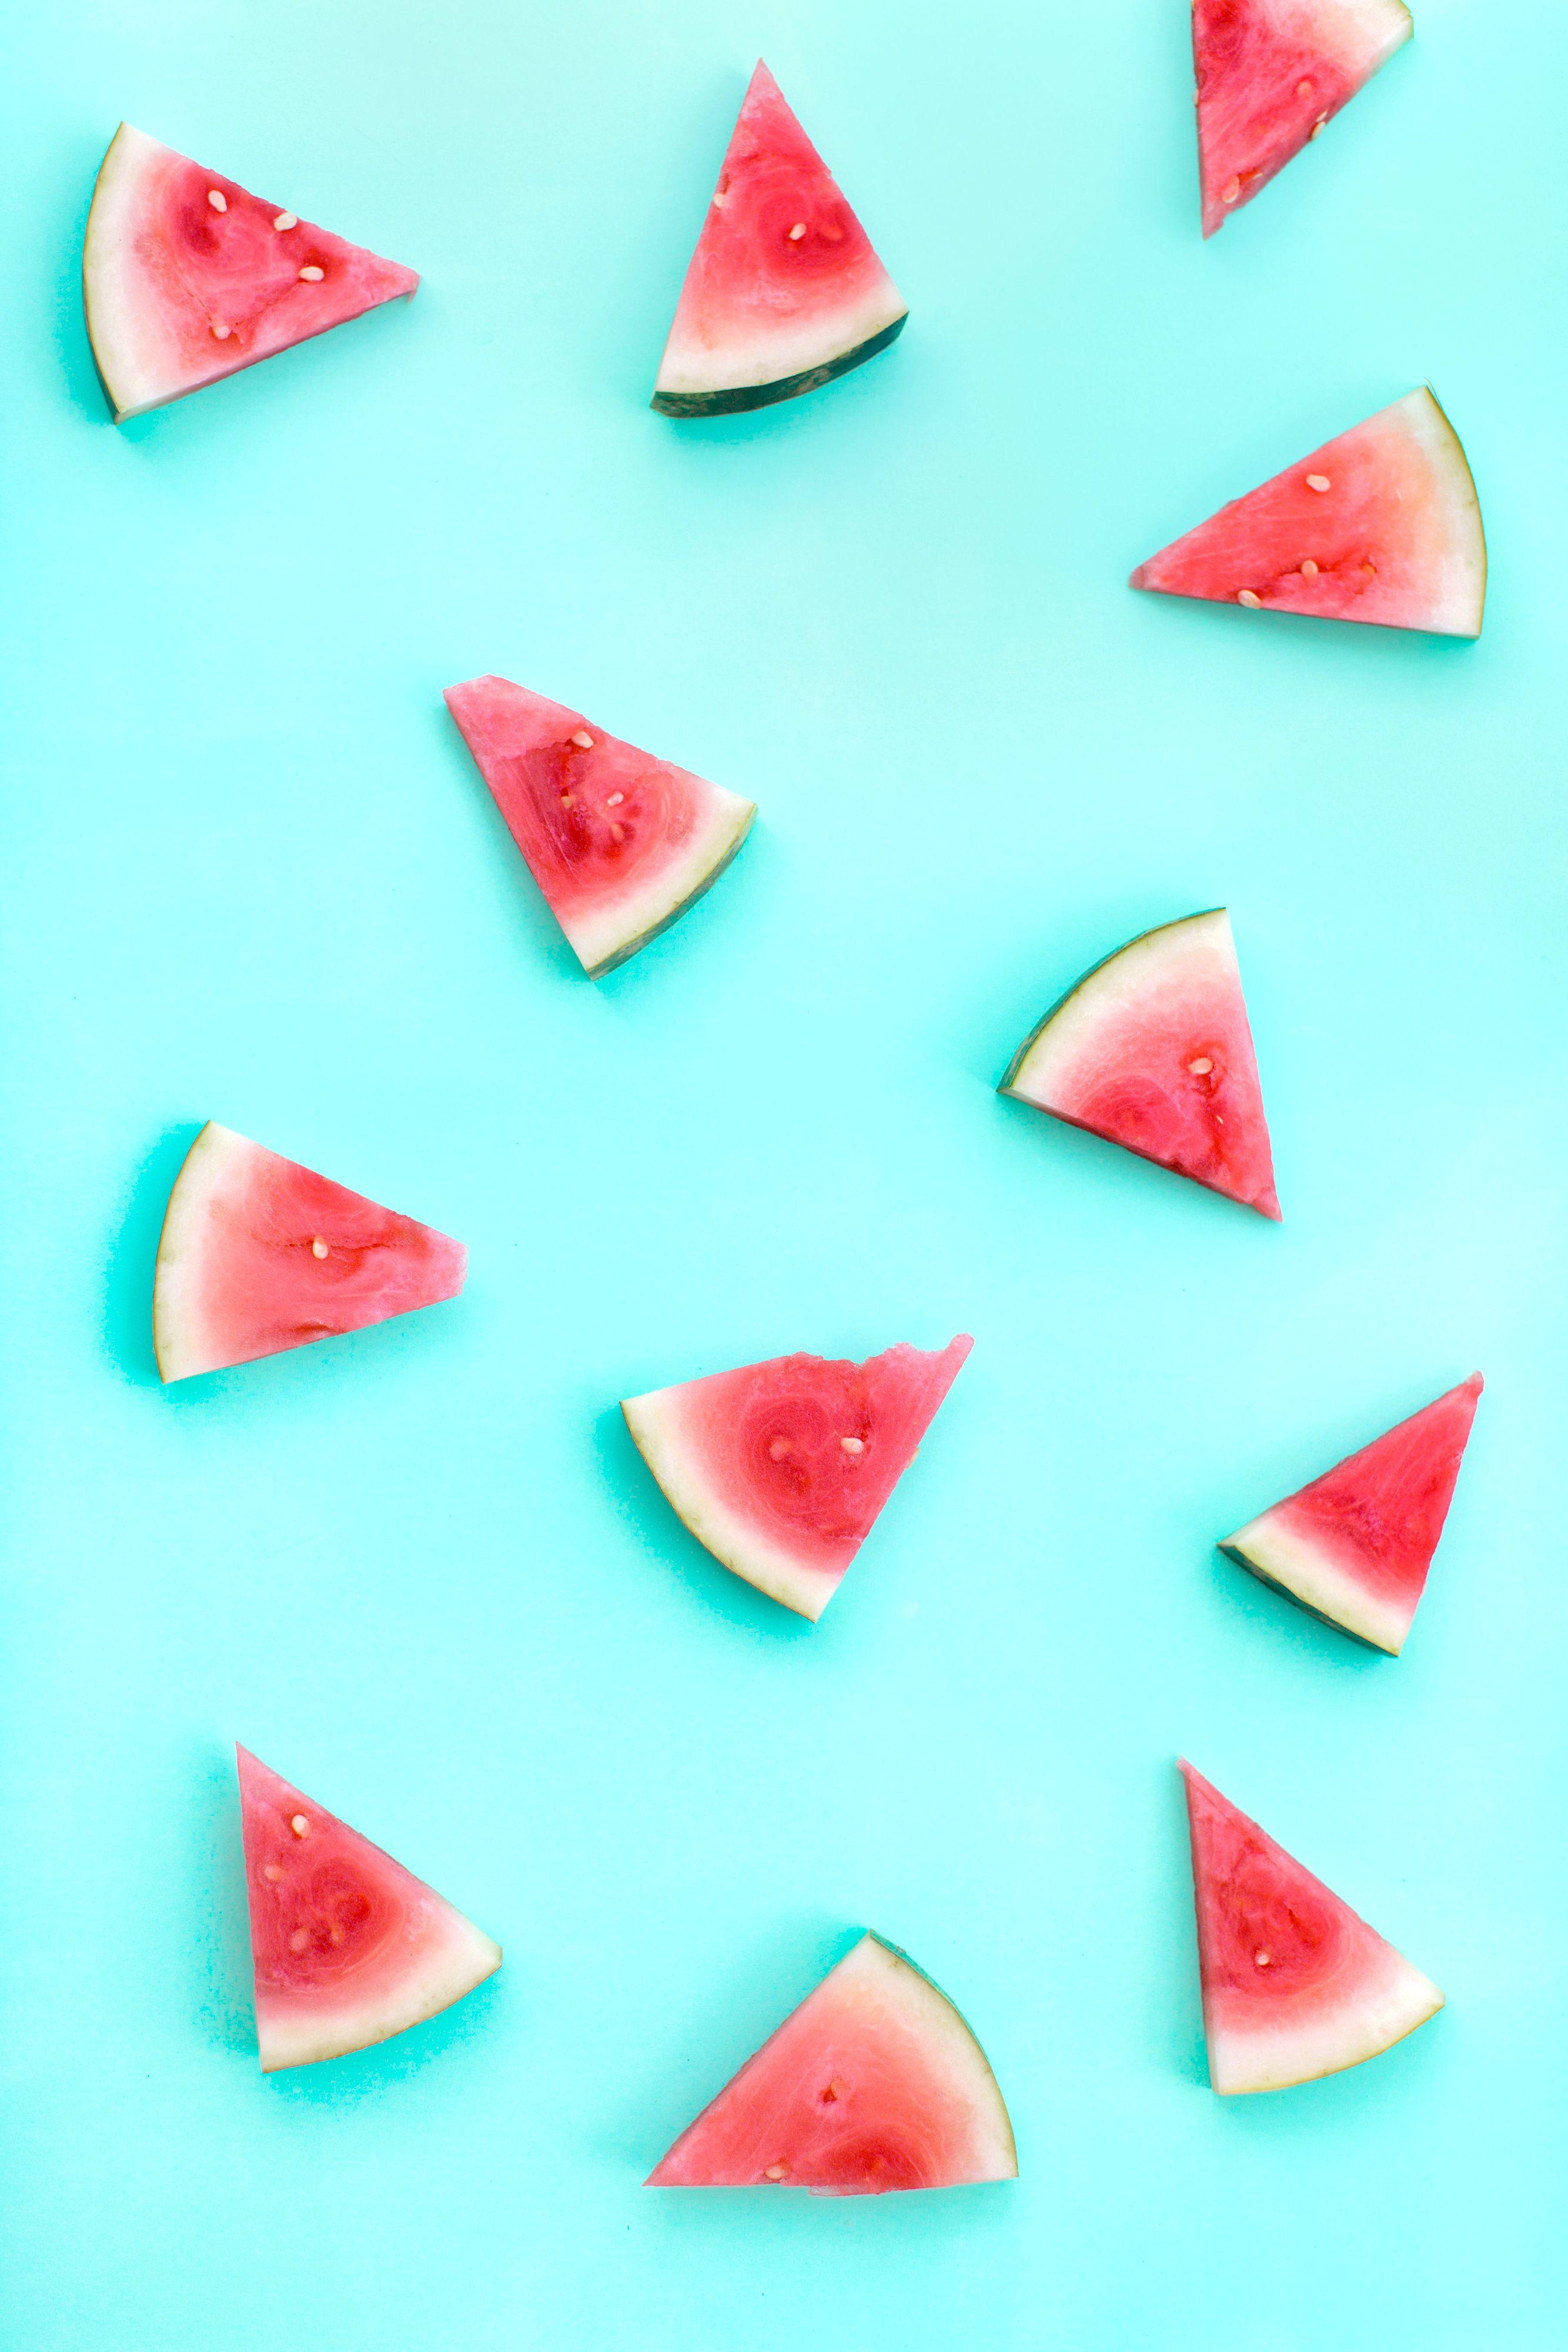 Summer Pinterest Wallpaper Hd #iphone #popular #summer #wallpapers 47 most popular summer wallpapers for your iphone iphone wallpapers, summer wallpapers, wallpaper iphone tumblr #life #trail #songs #god. summer pinterest wallpaper hd